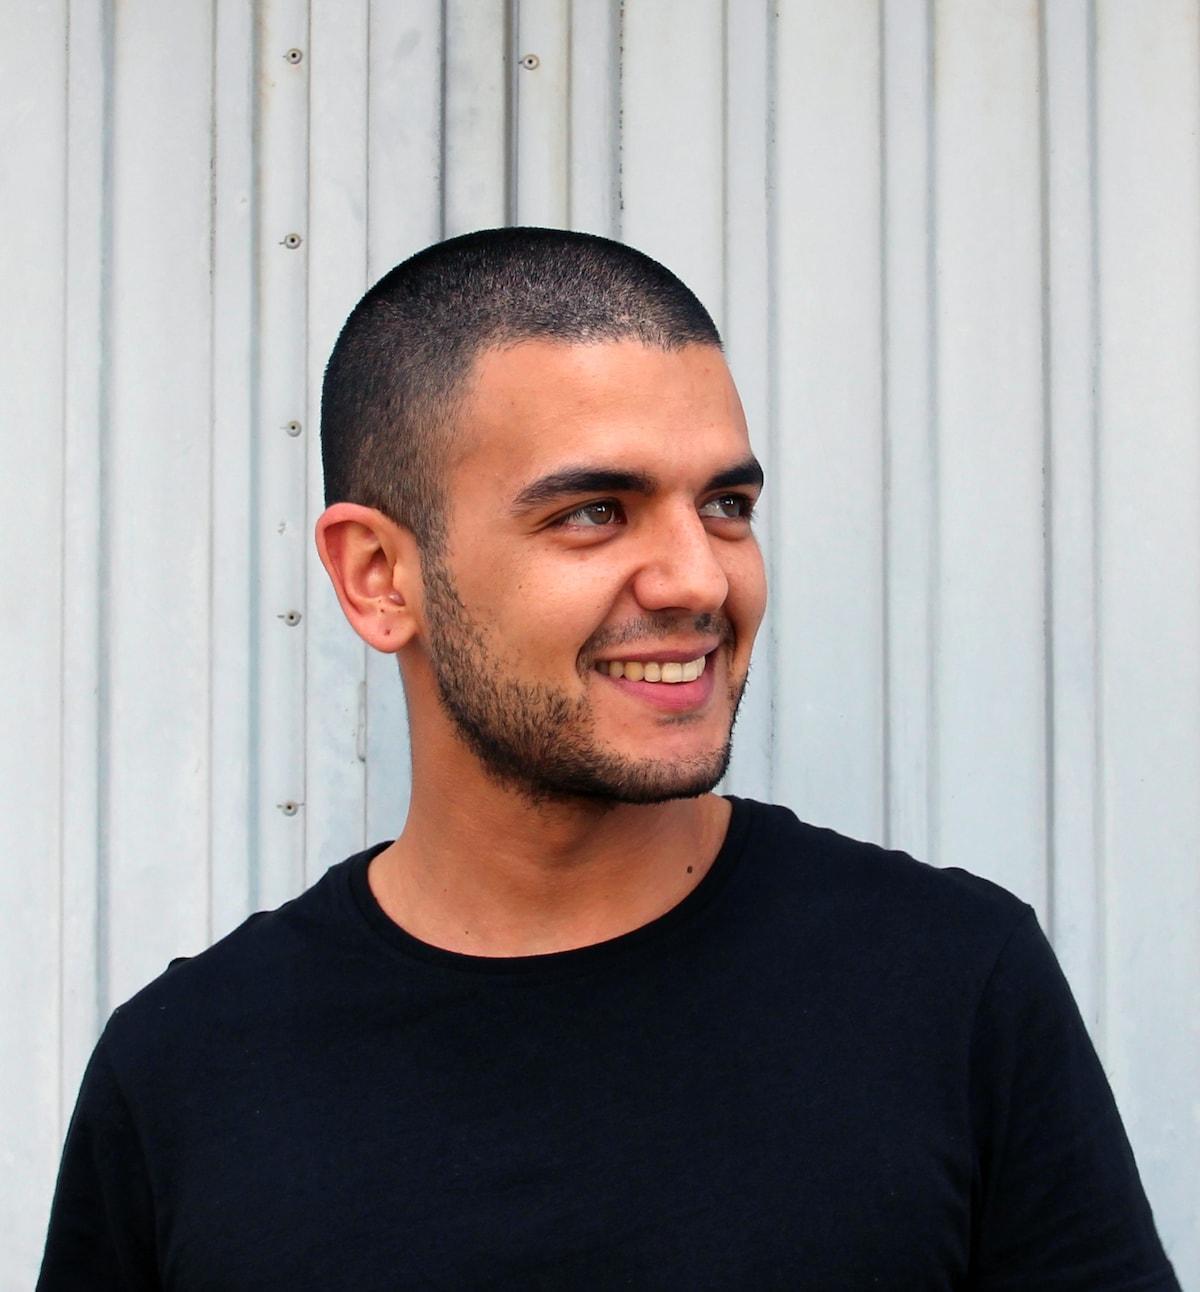 João from Setúbal